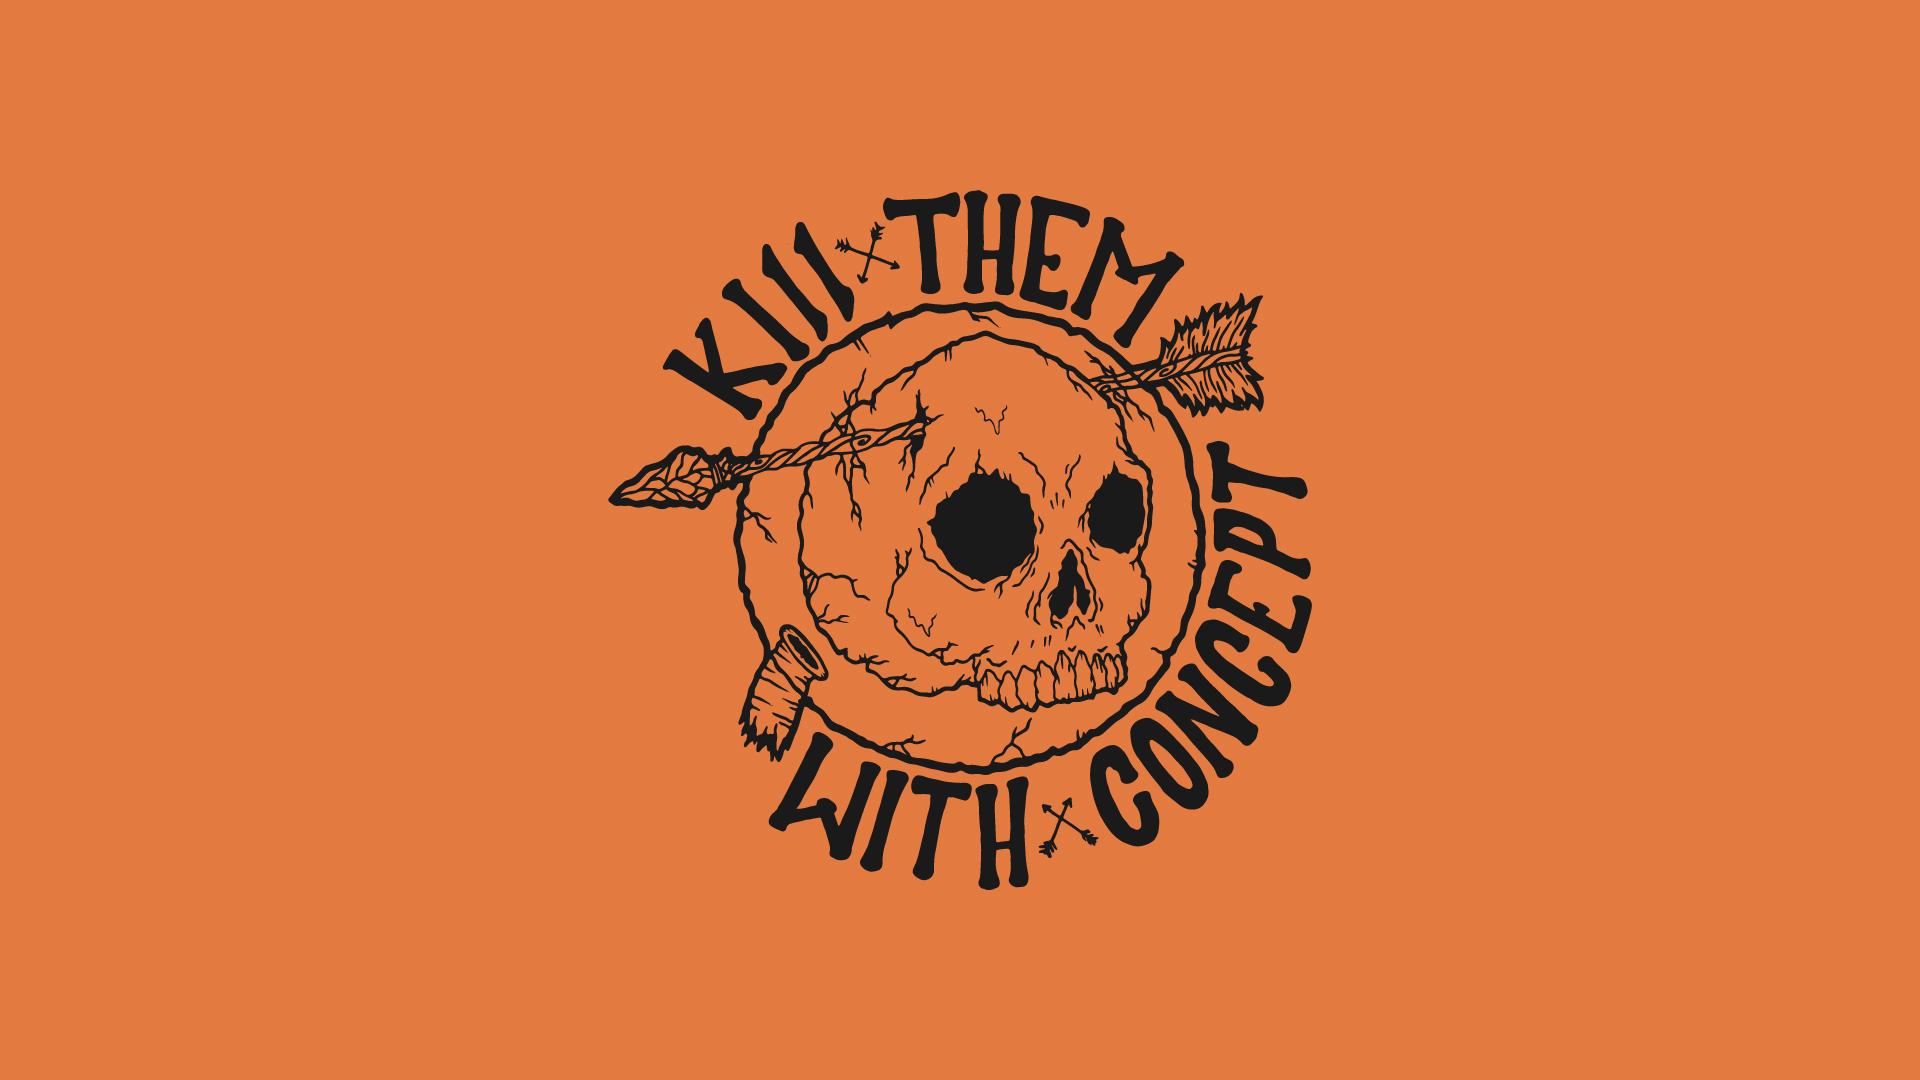 Sauceda_Illustration_KillThem.jpg